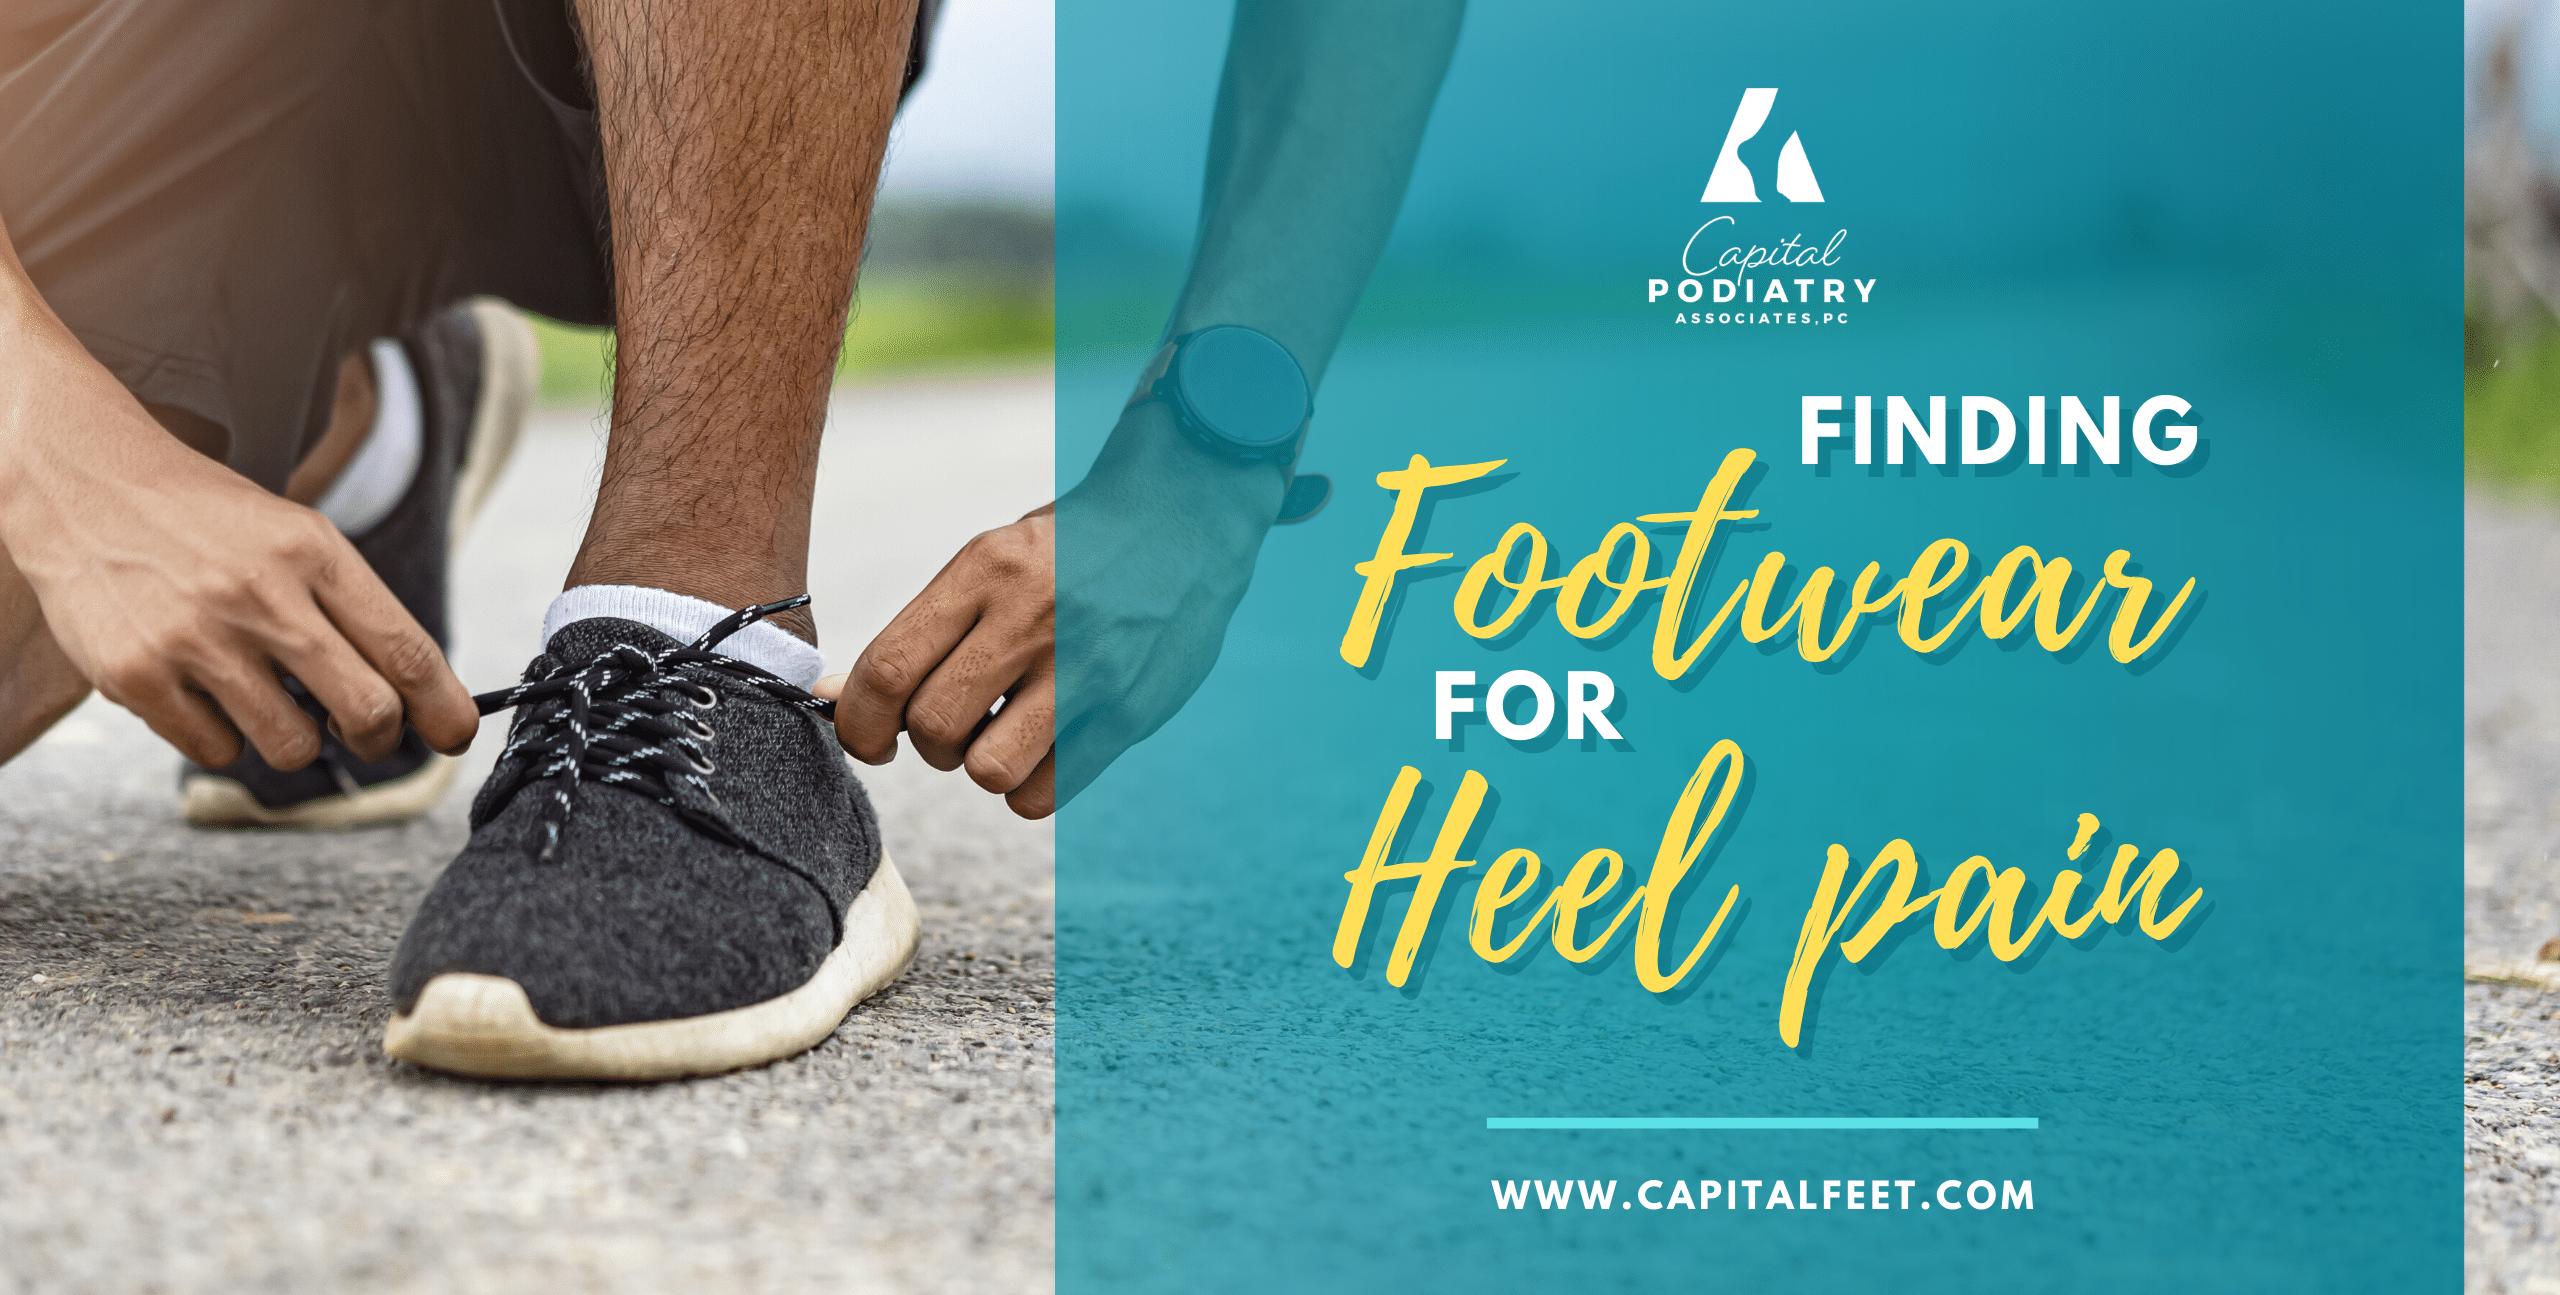 Finding Footwear for Heel Pain